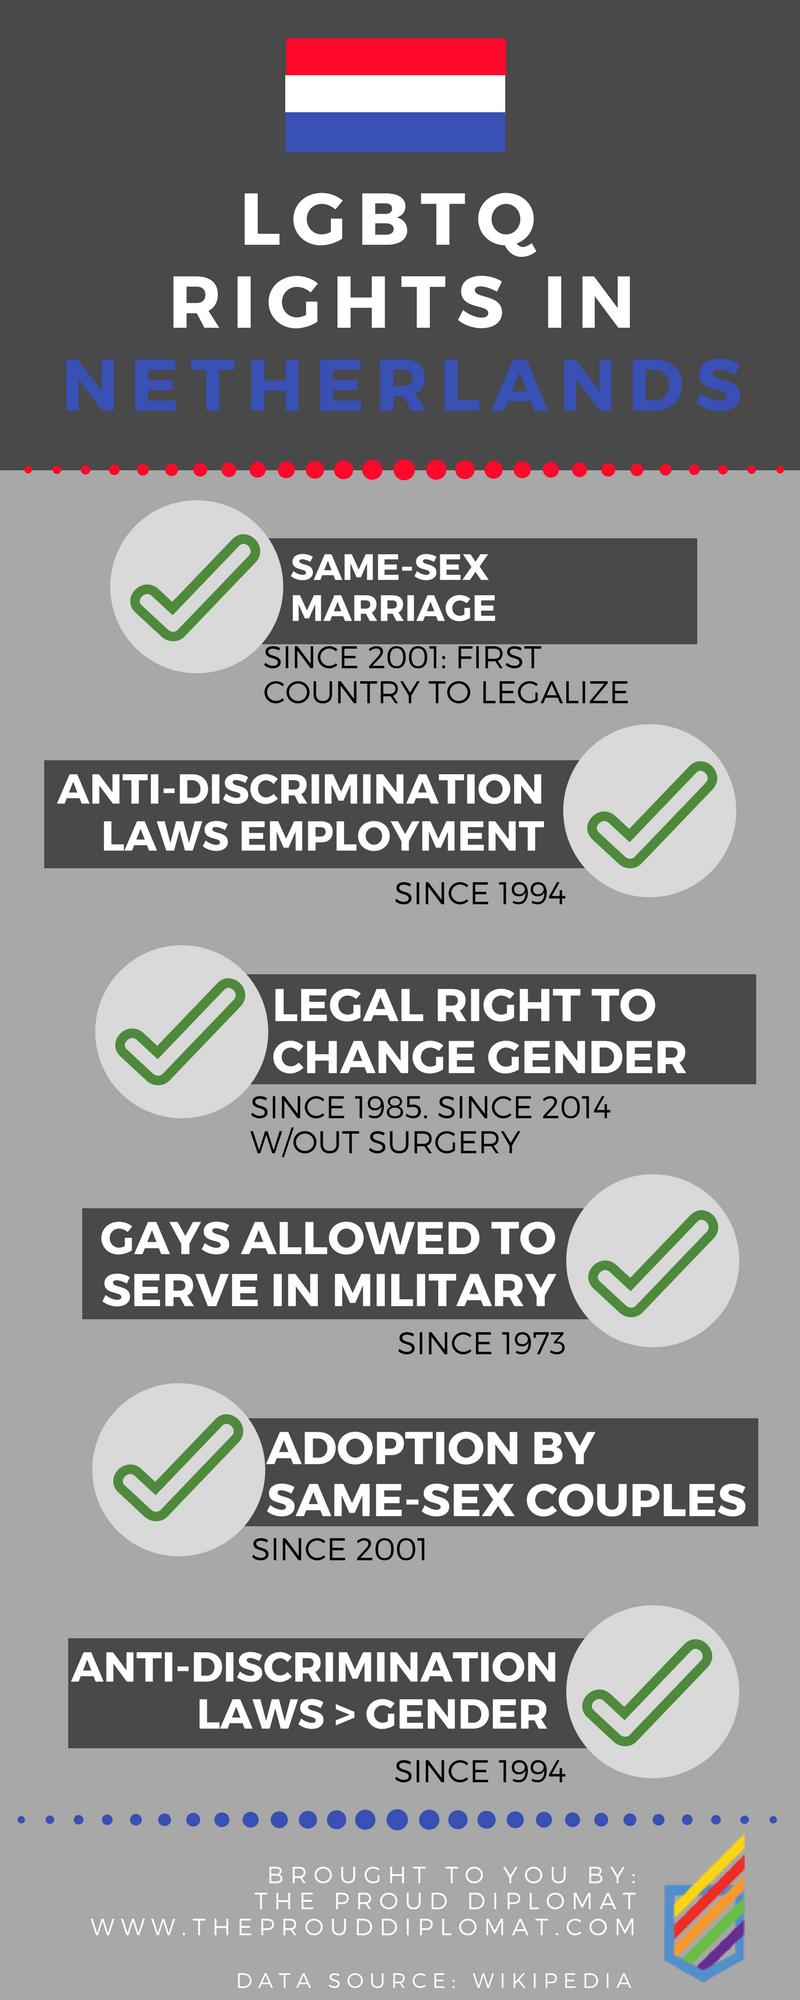 LGBTQ-Rights-In-Netherlands-theprouddiplomat